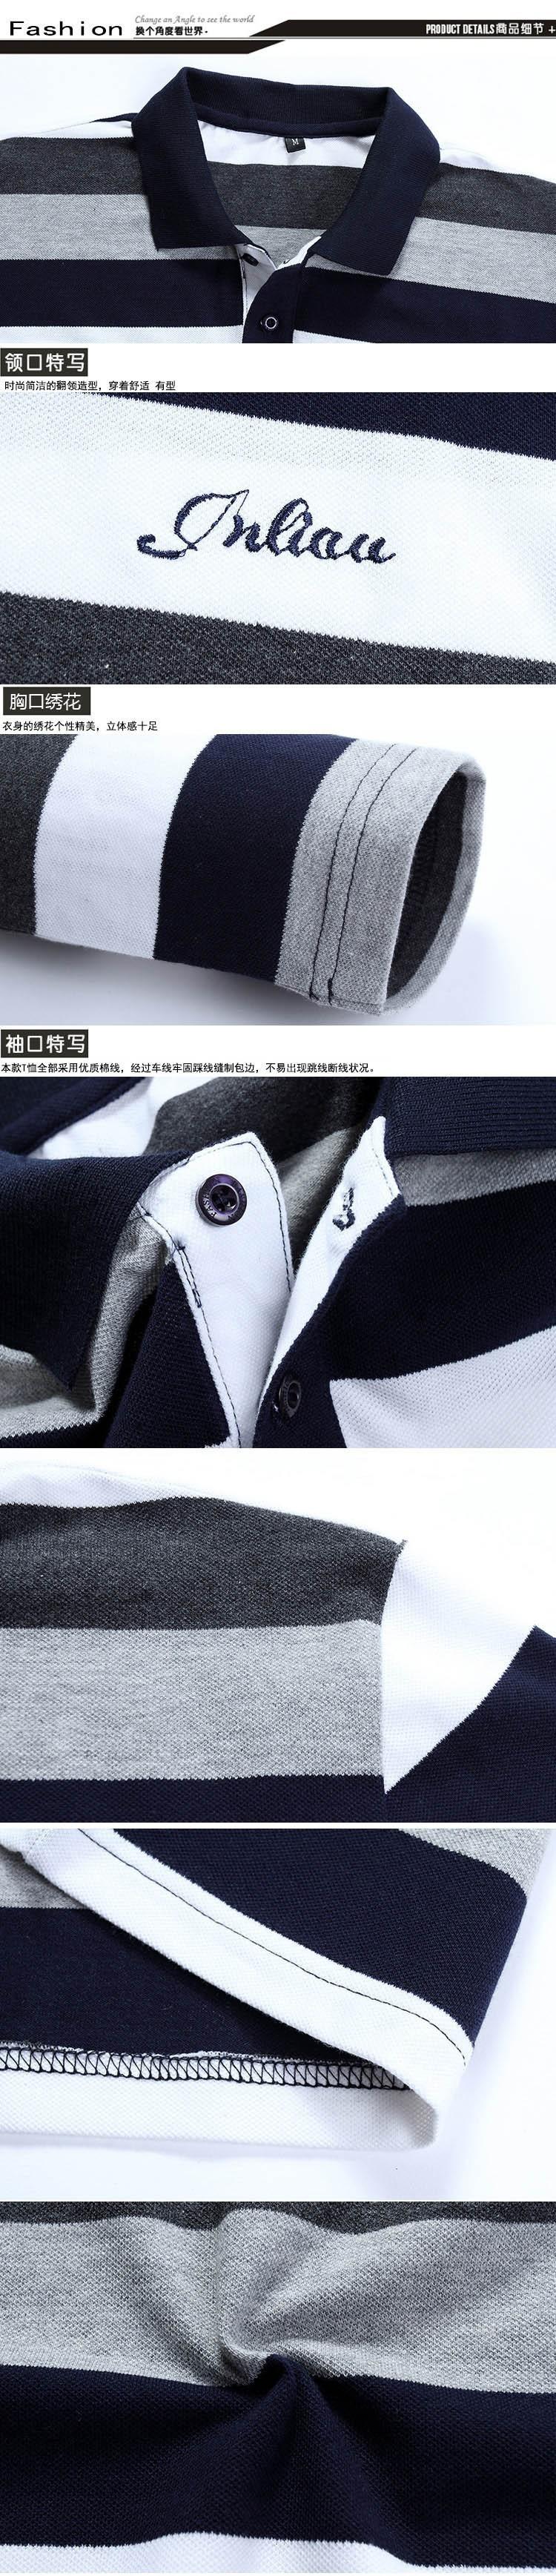 Camiseta Masculino Gola Polo Lengan Pendek 100 Katun Kemeja Pria Benedict Navy Denim Ss Getsubject Aeproductgetsubject